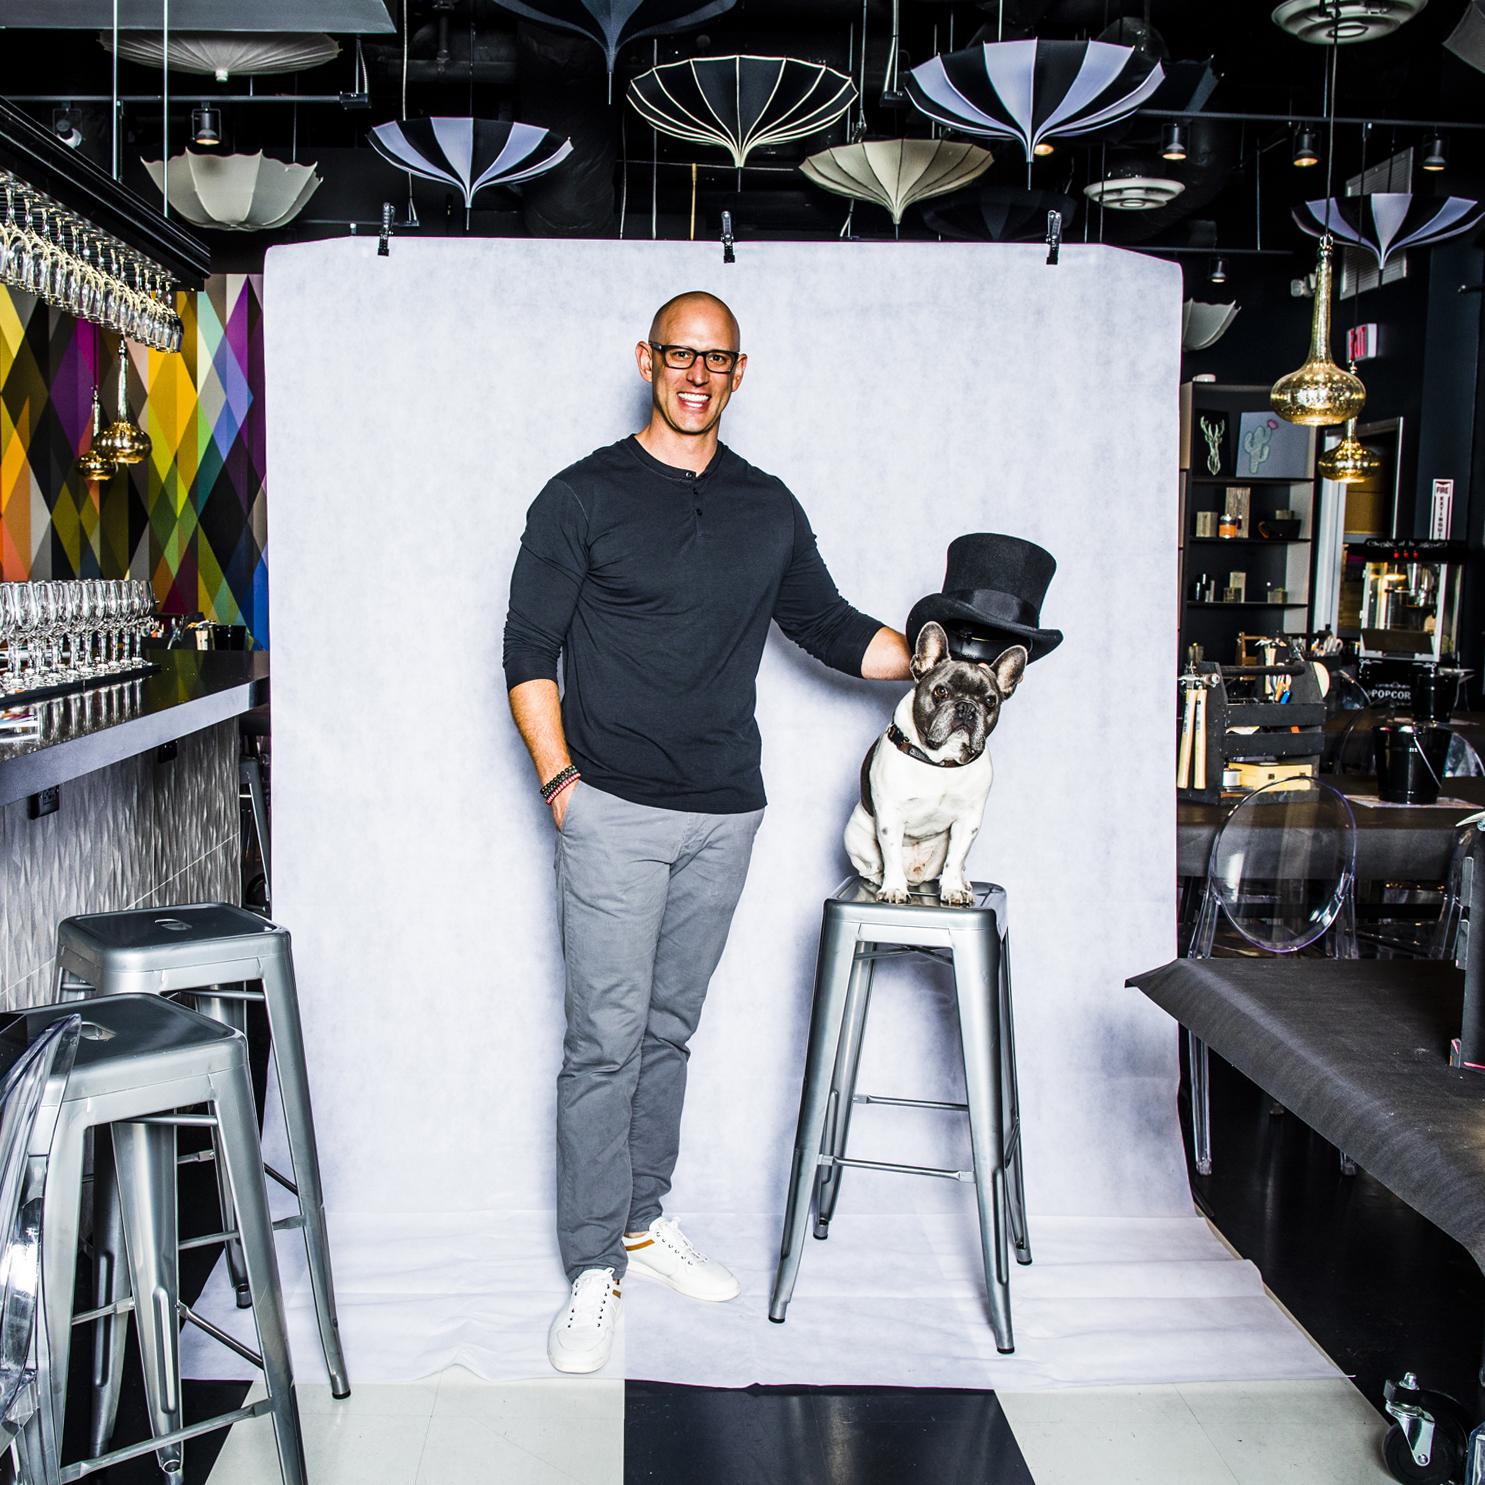 Matt Johannsen - Josie - Upstairs Circus Founder - Denver, CO